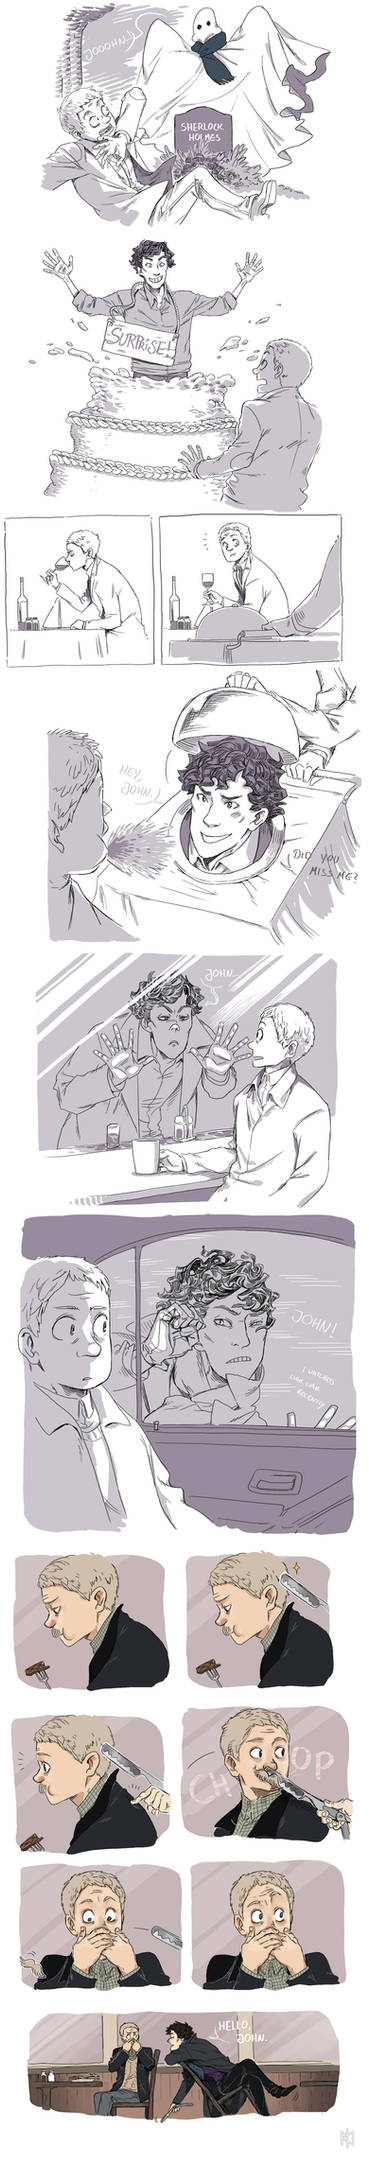 Sherlock's Return by Tamasaburo09